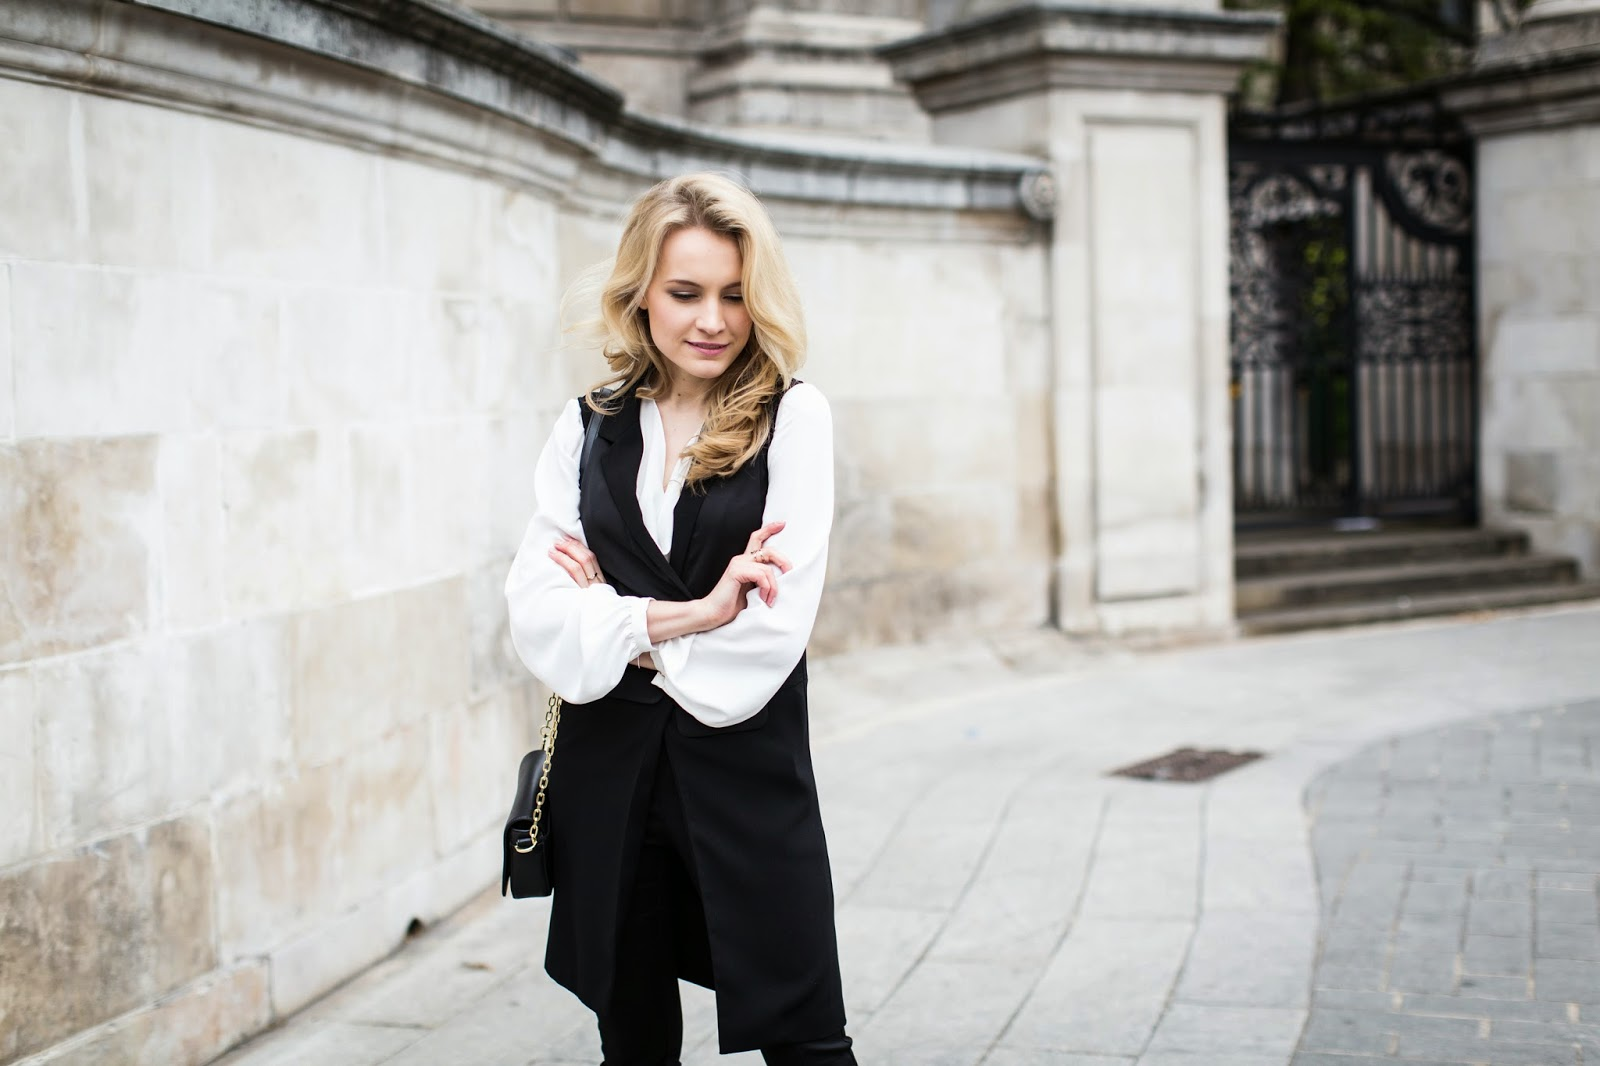 Fashion blogger based in London